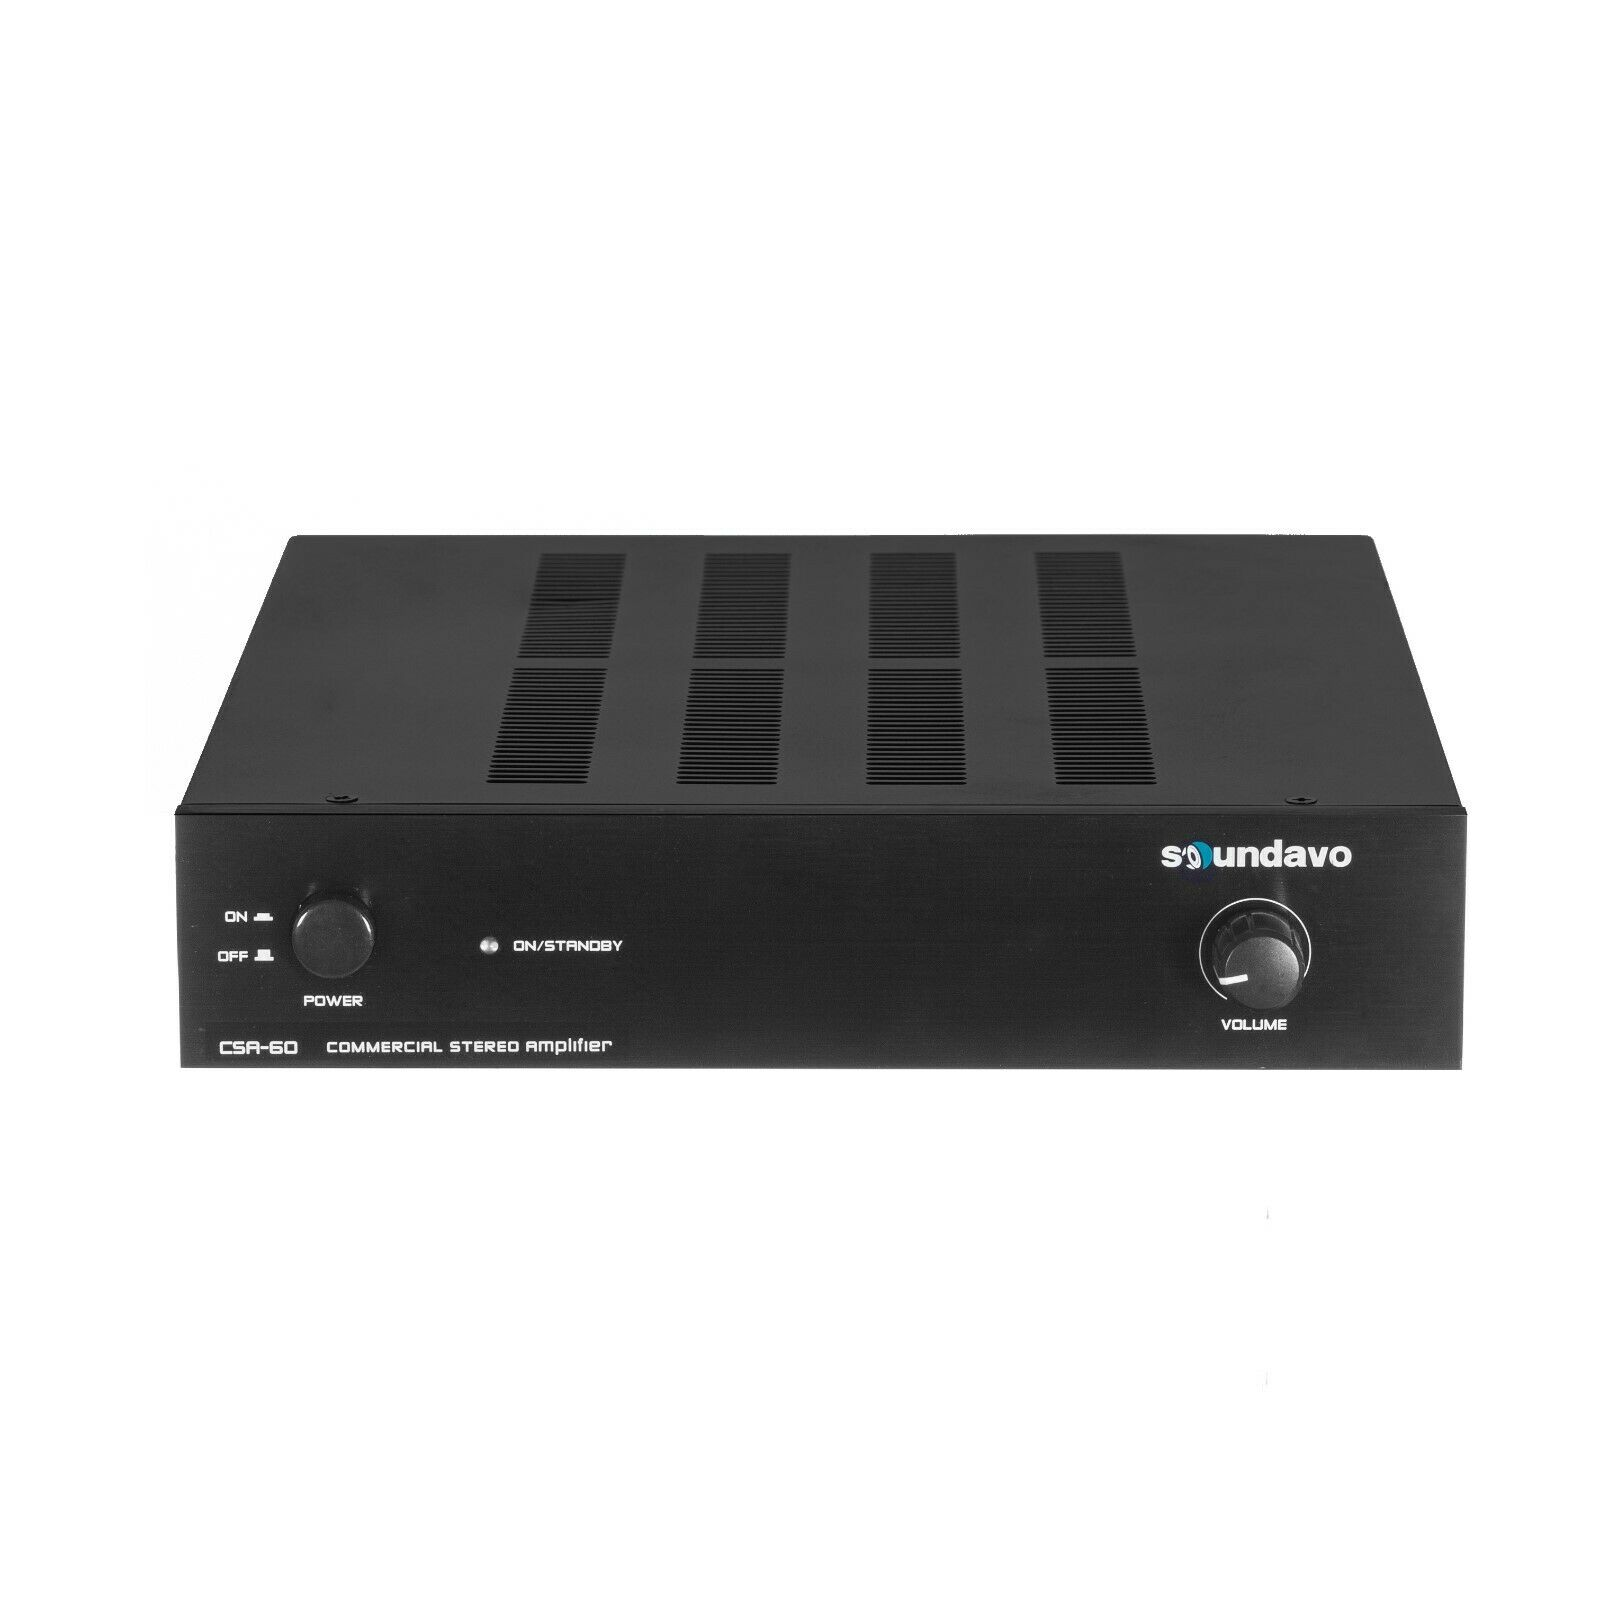 Soundavo CSA-60 Stereo Amplifier for Home Audio